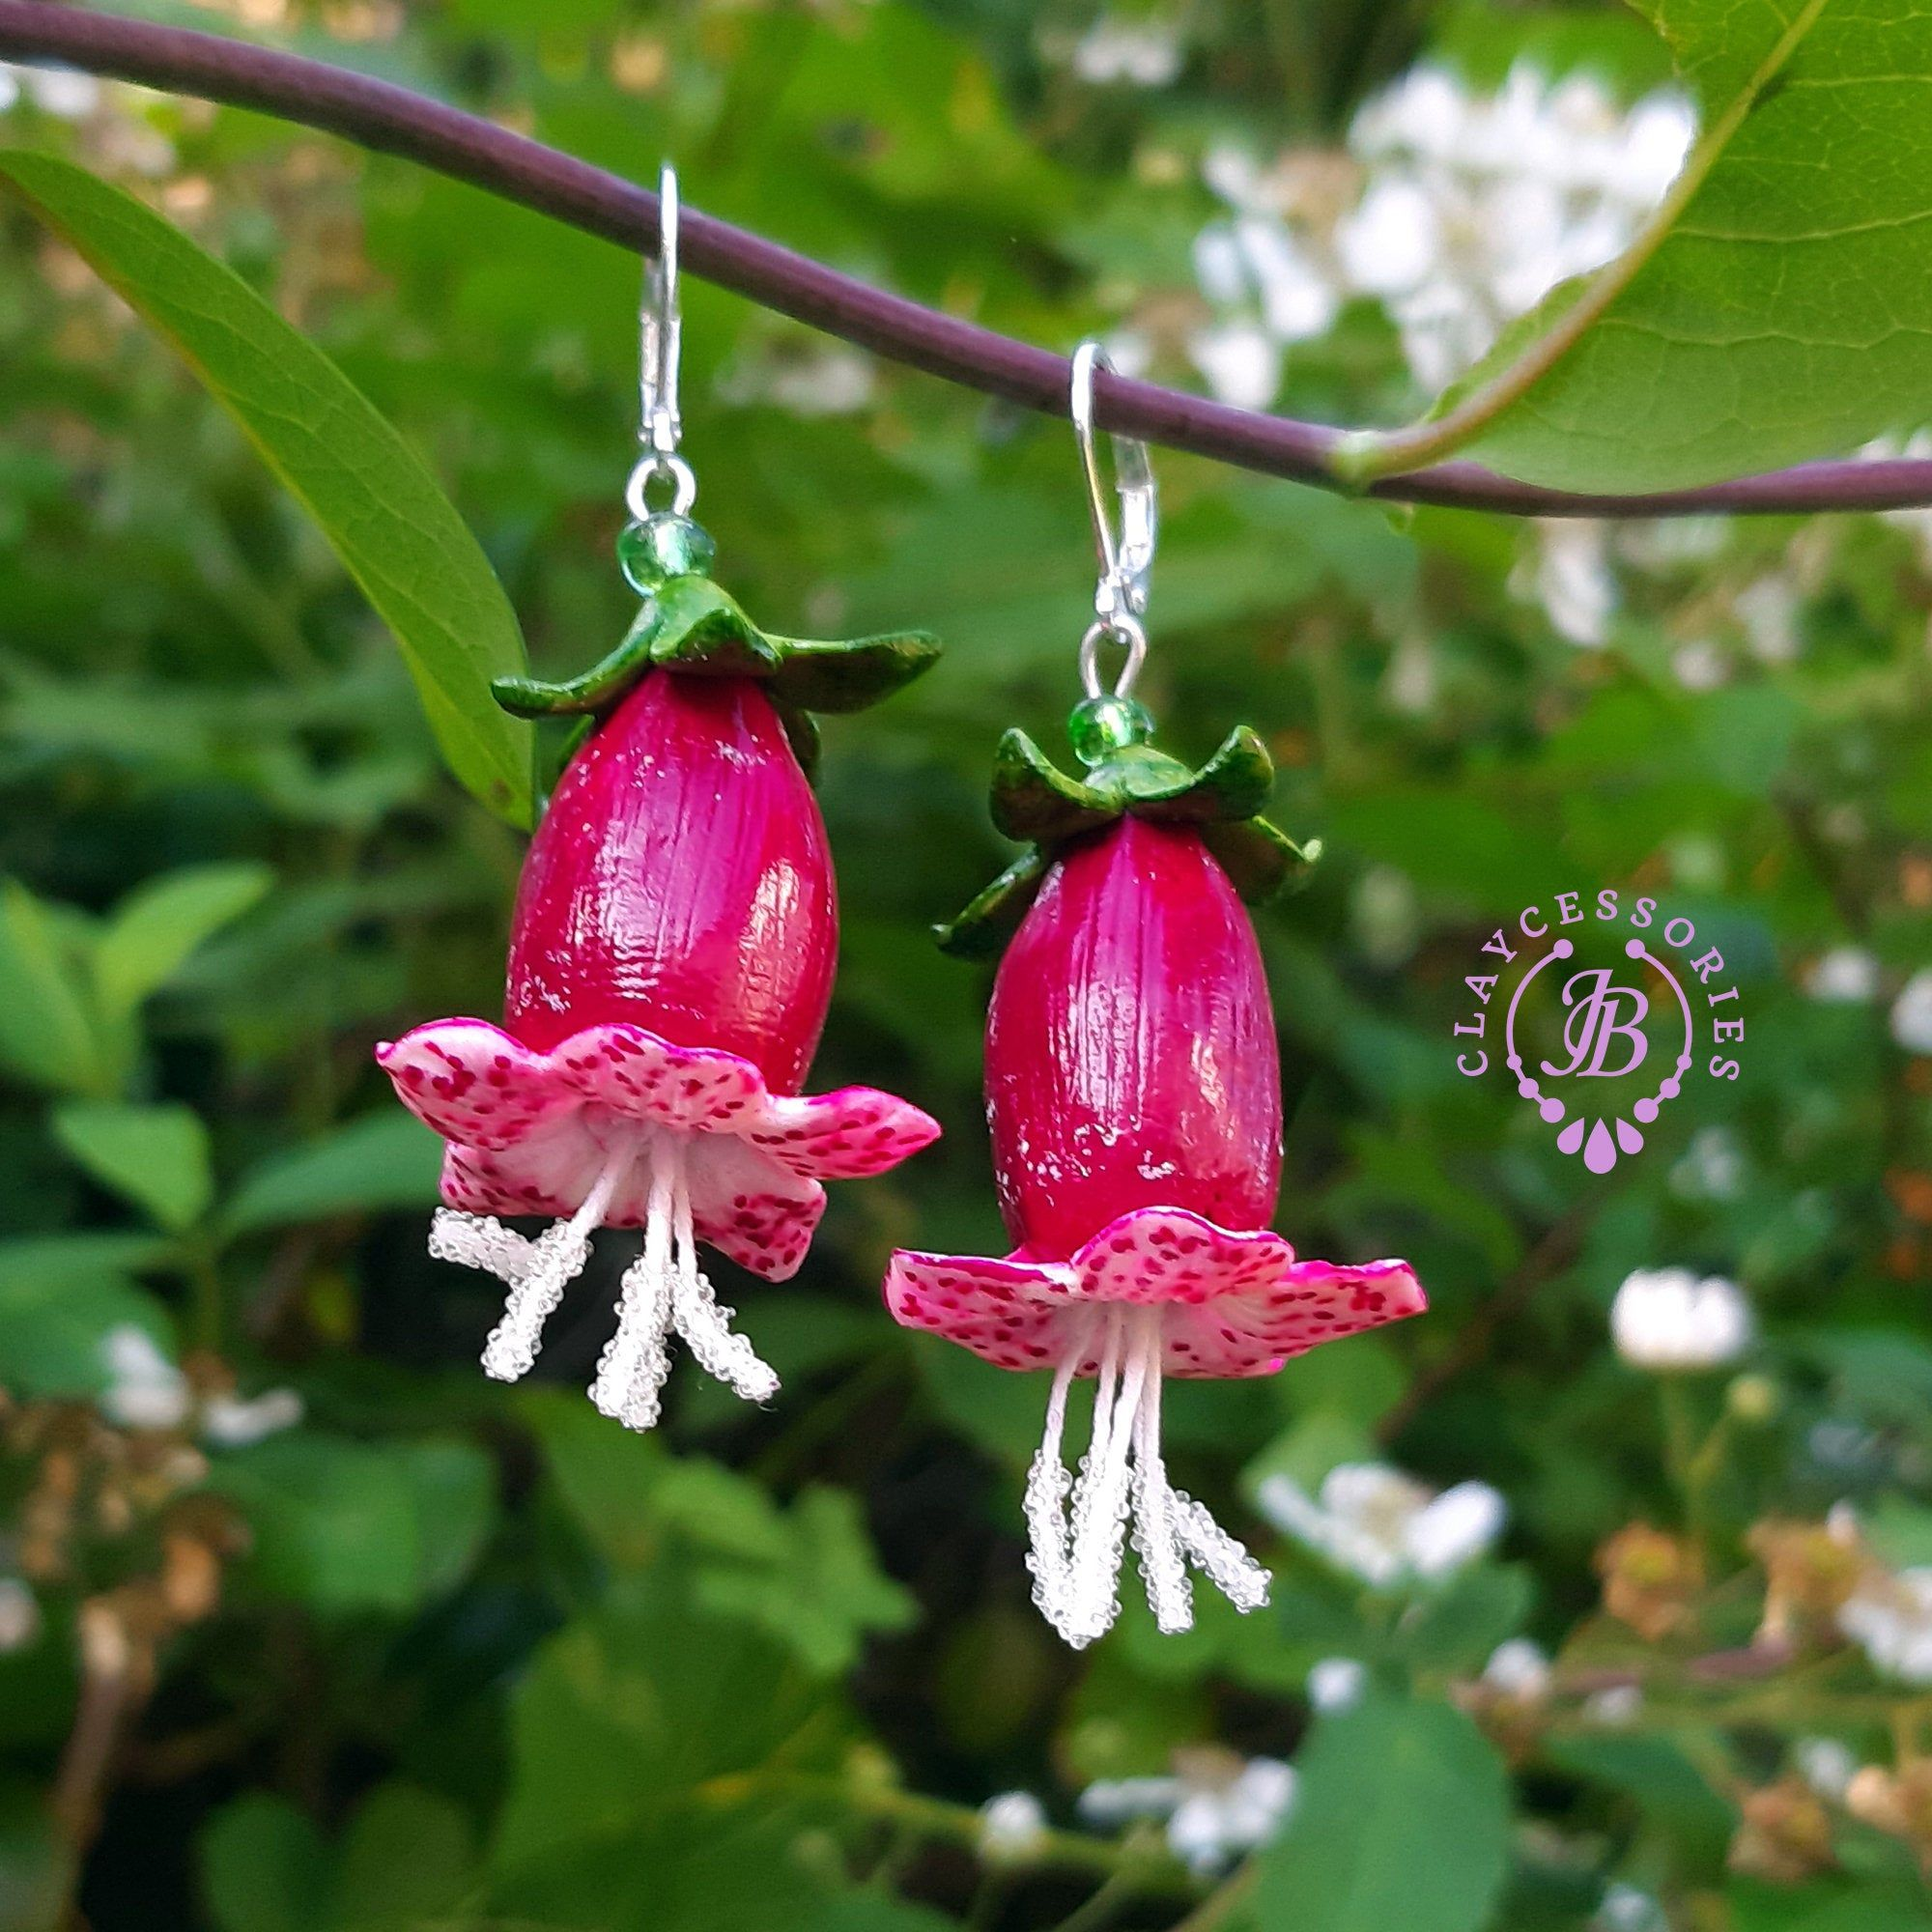 Bell flowers earrings Botanical earrings with bell flowers